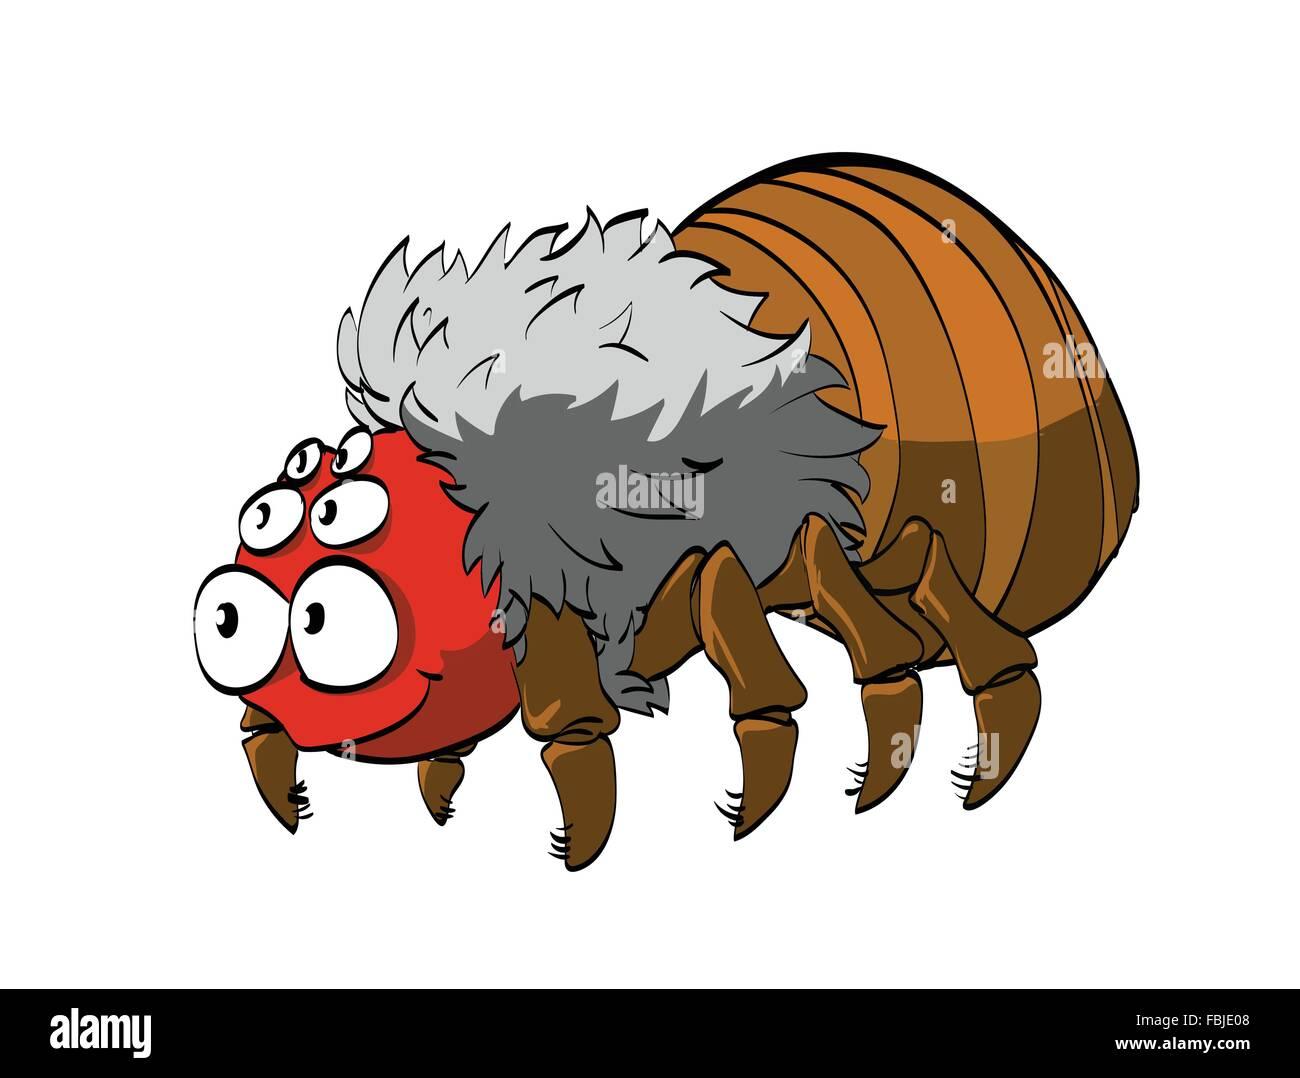 Cute cartoon friendly tarantula or hairy spider - Stock Image